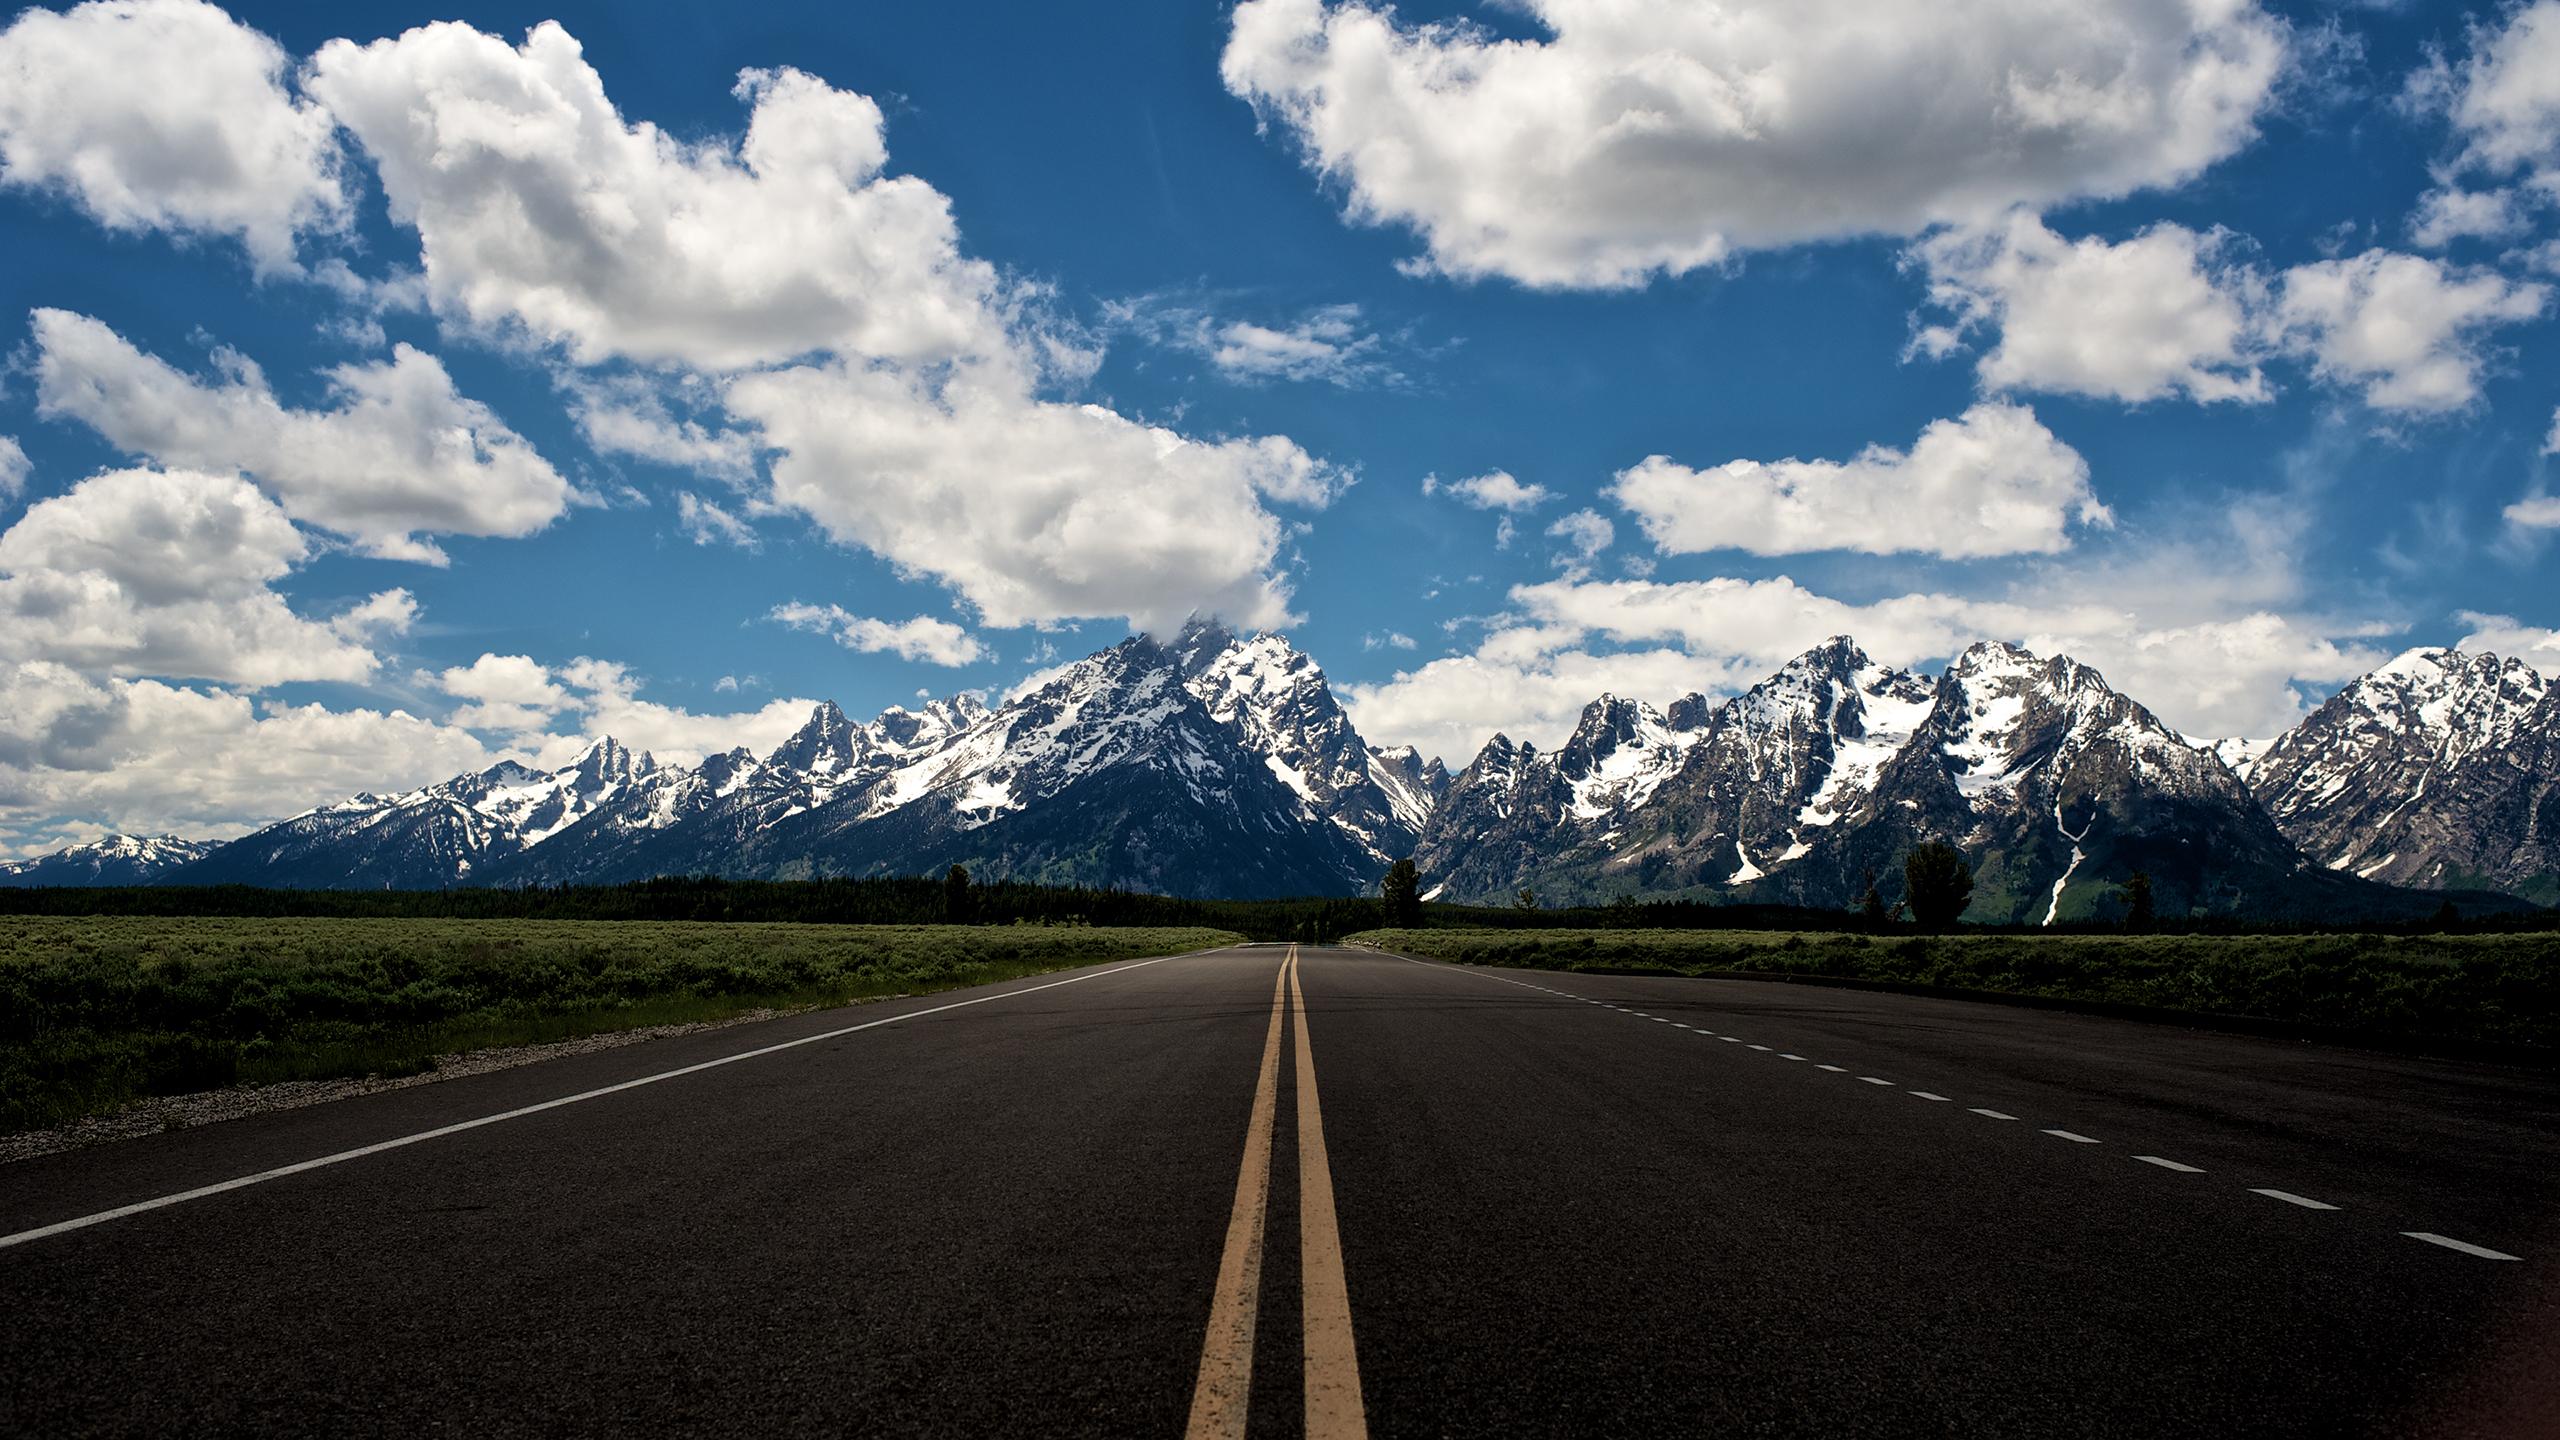 road_to_sky_wallpaper_2560x1440